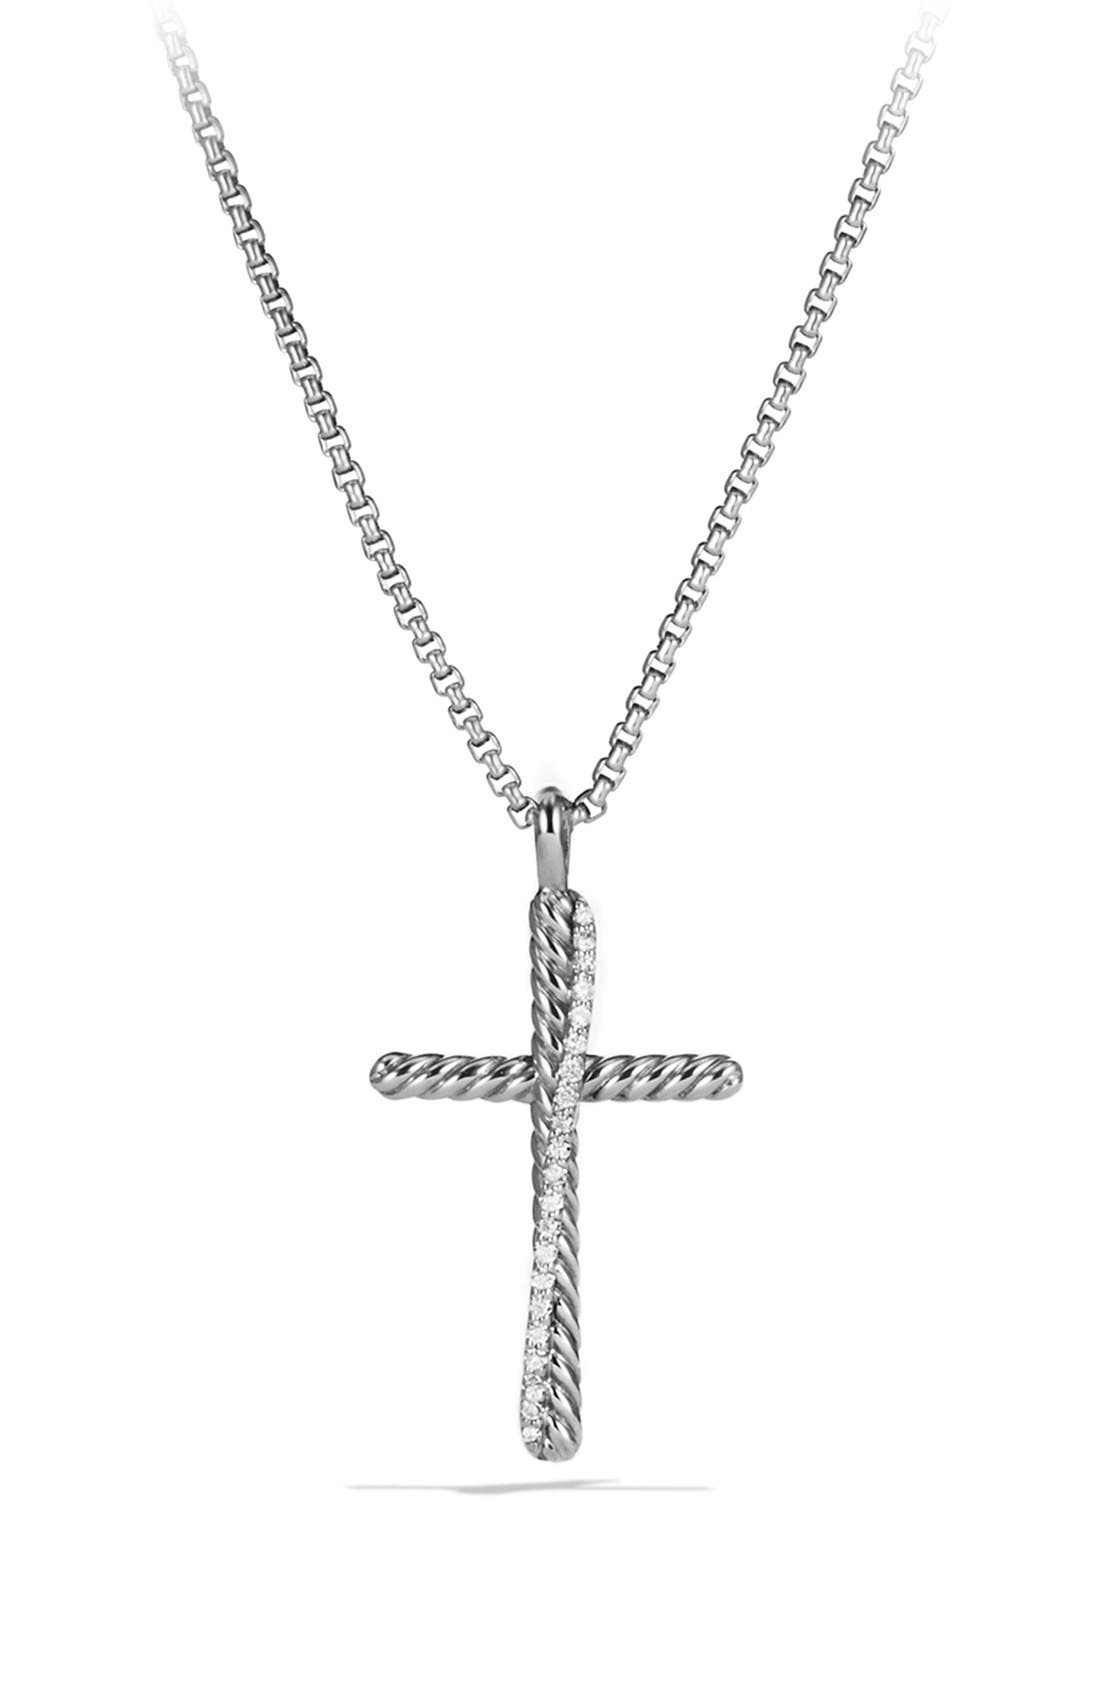 David Yurman 'Crossover' Cross Necklace